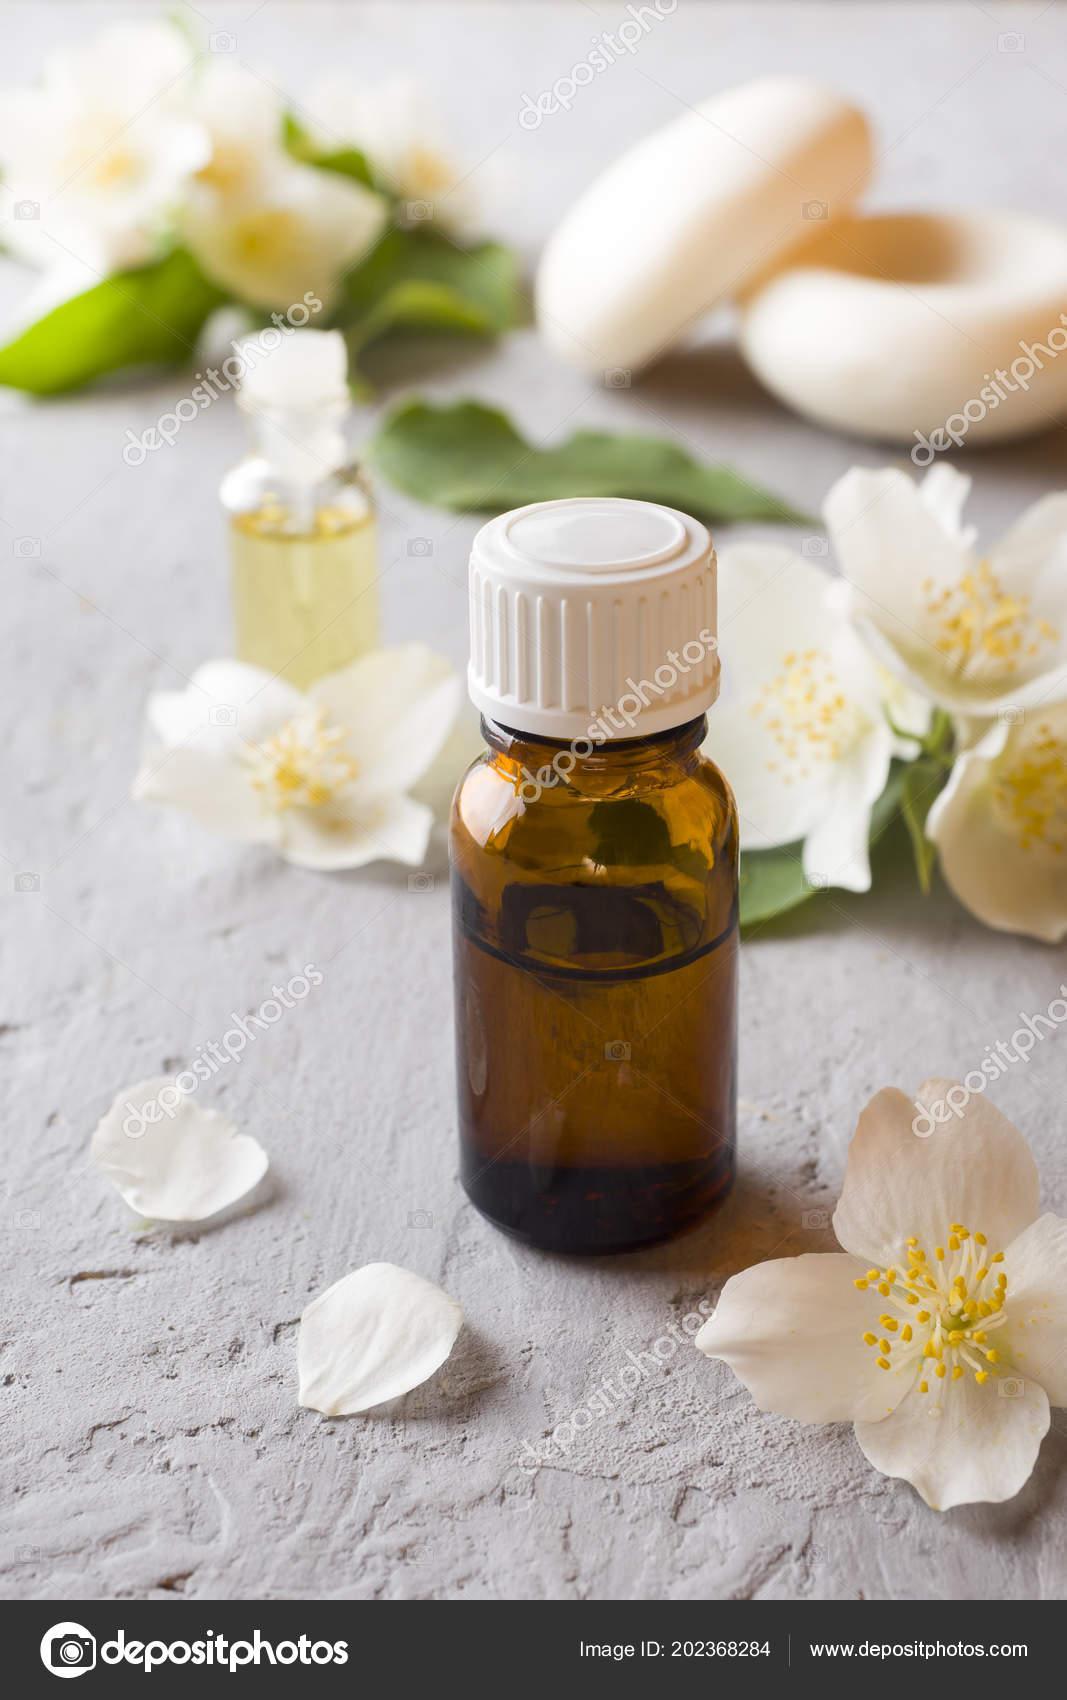 Jasmine oil aromatherapy jasmine oil soap jasmine flower stock jasmine oil aromatherapy jasmine oil soap jasmine flower stock photo izmirmasajfo